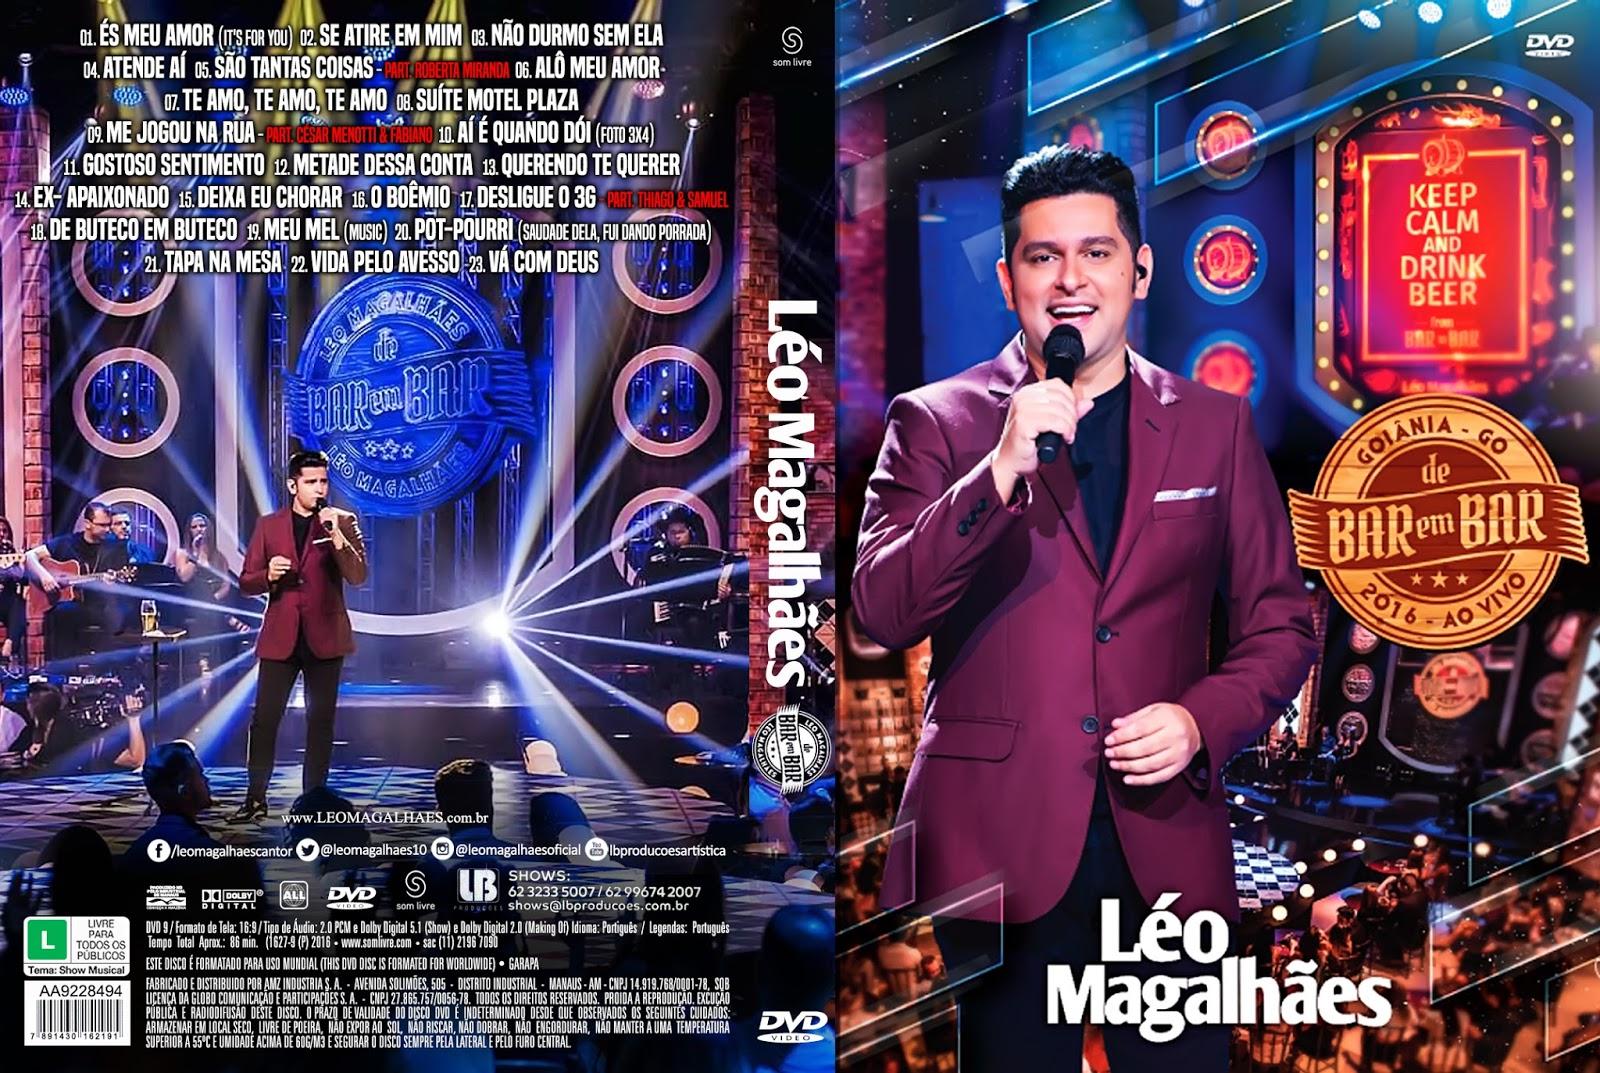 Download Léo Magalhães De Bar em Bar DVDRip 2016 Download Léo Magalhães De Bar em Bar DVDRip 2016 Leo 2BMagalh 25C3 25A3es 2B  2BDe 2BBar 2Bem 2BBar 2B 2528CAPA 2529